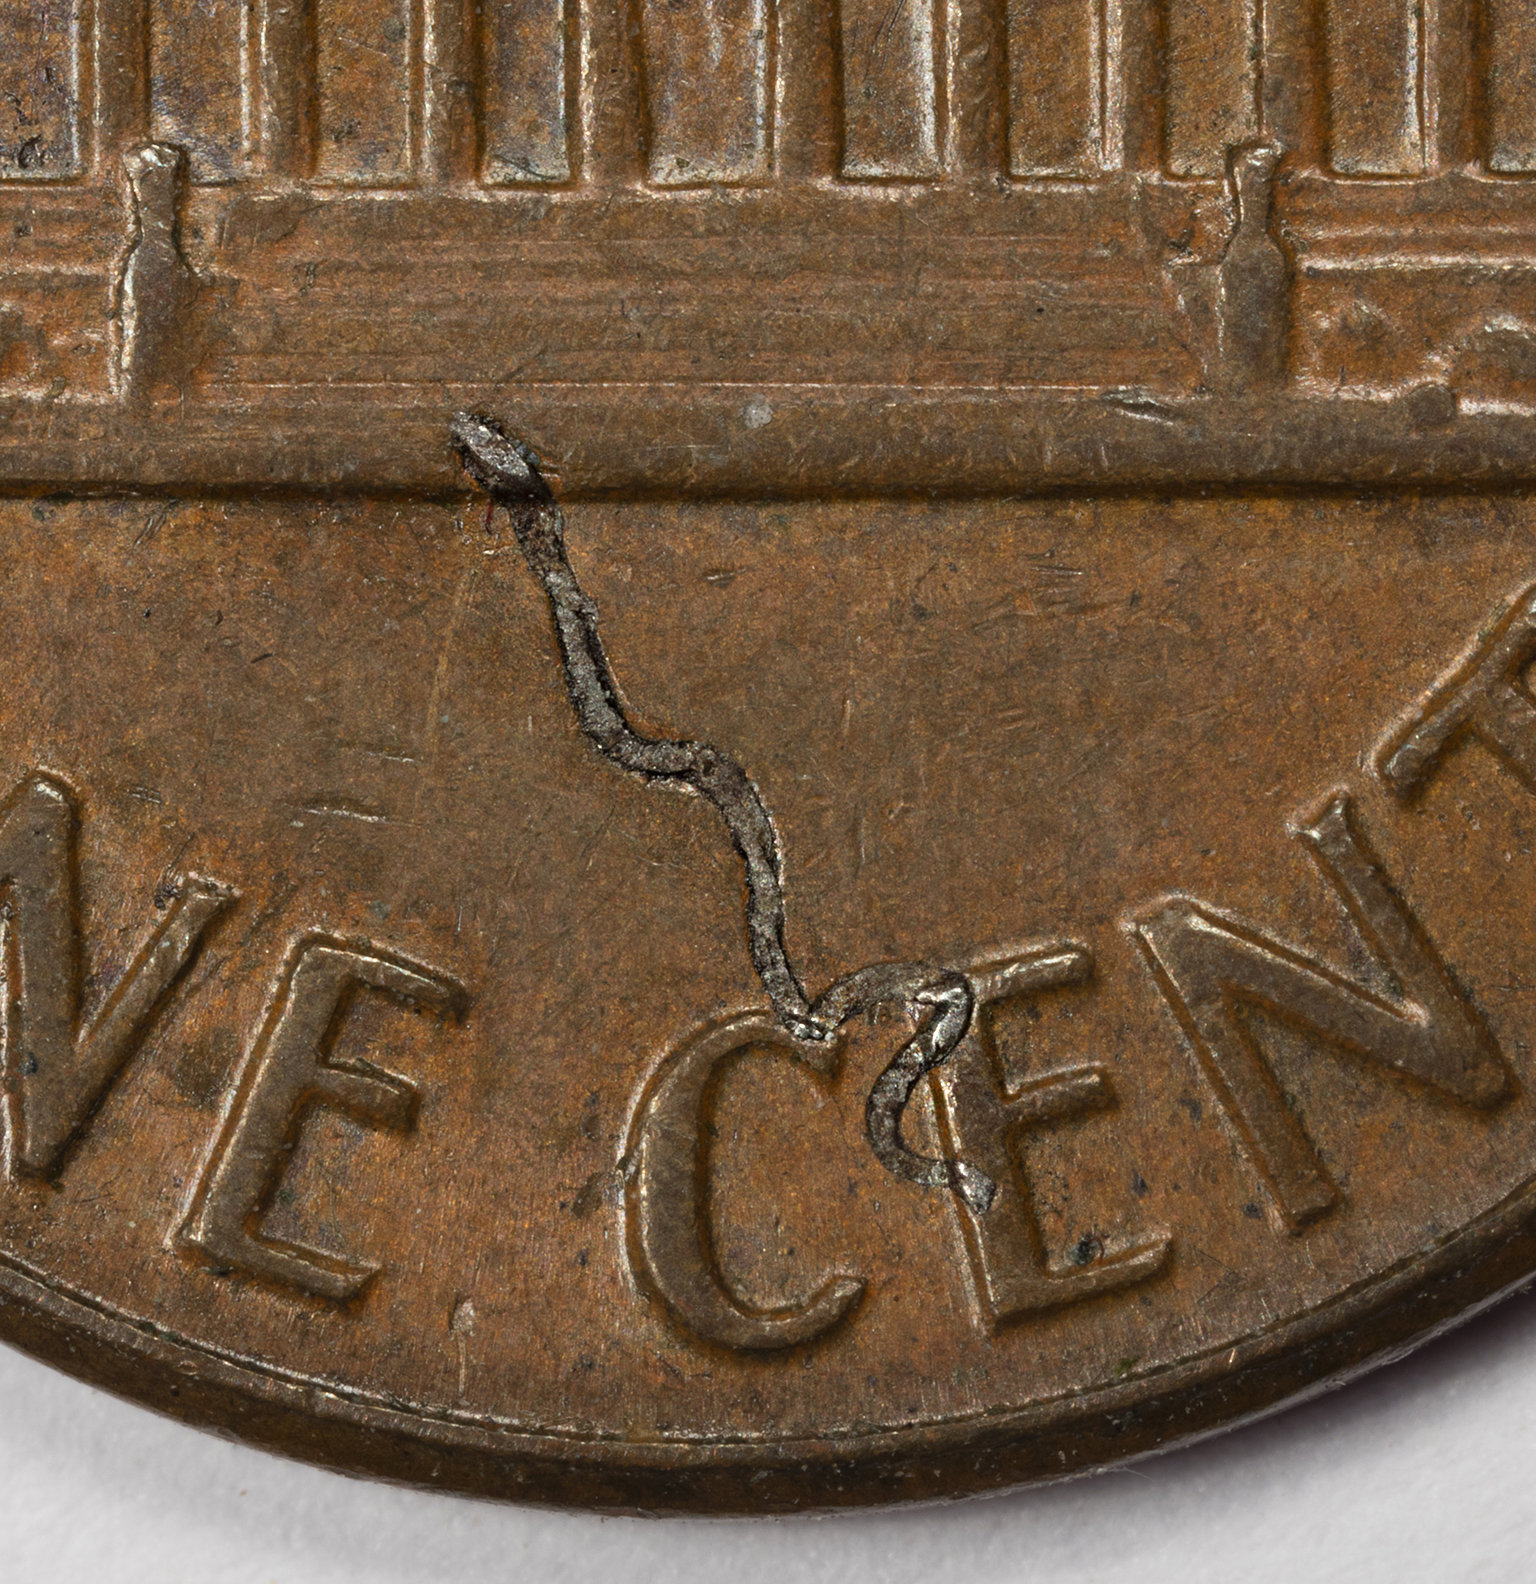 Link Ebay Str Ctf Error Coins Dmd1rtncLH Auction1